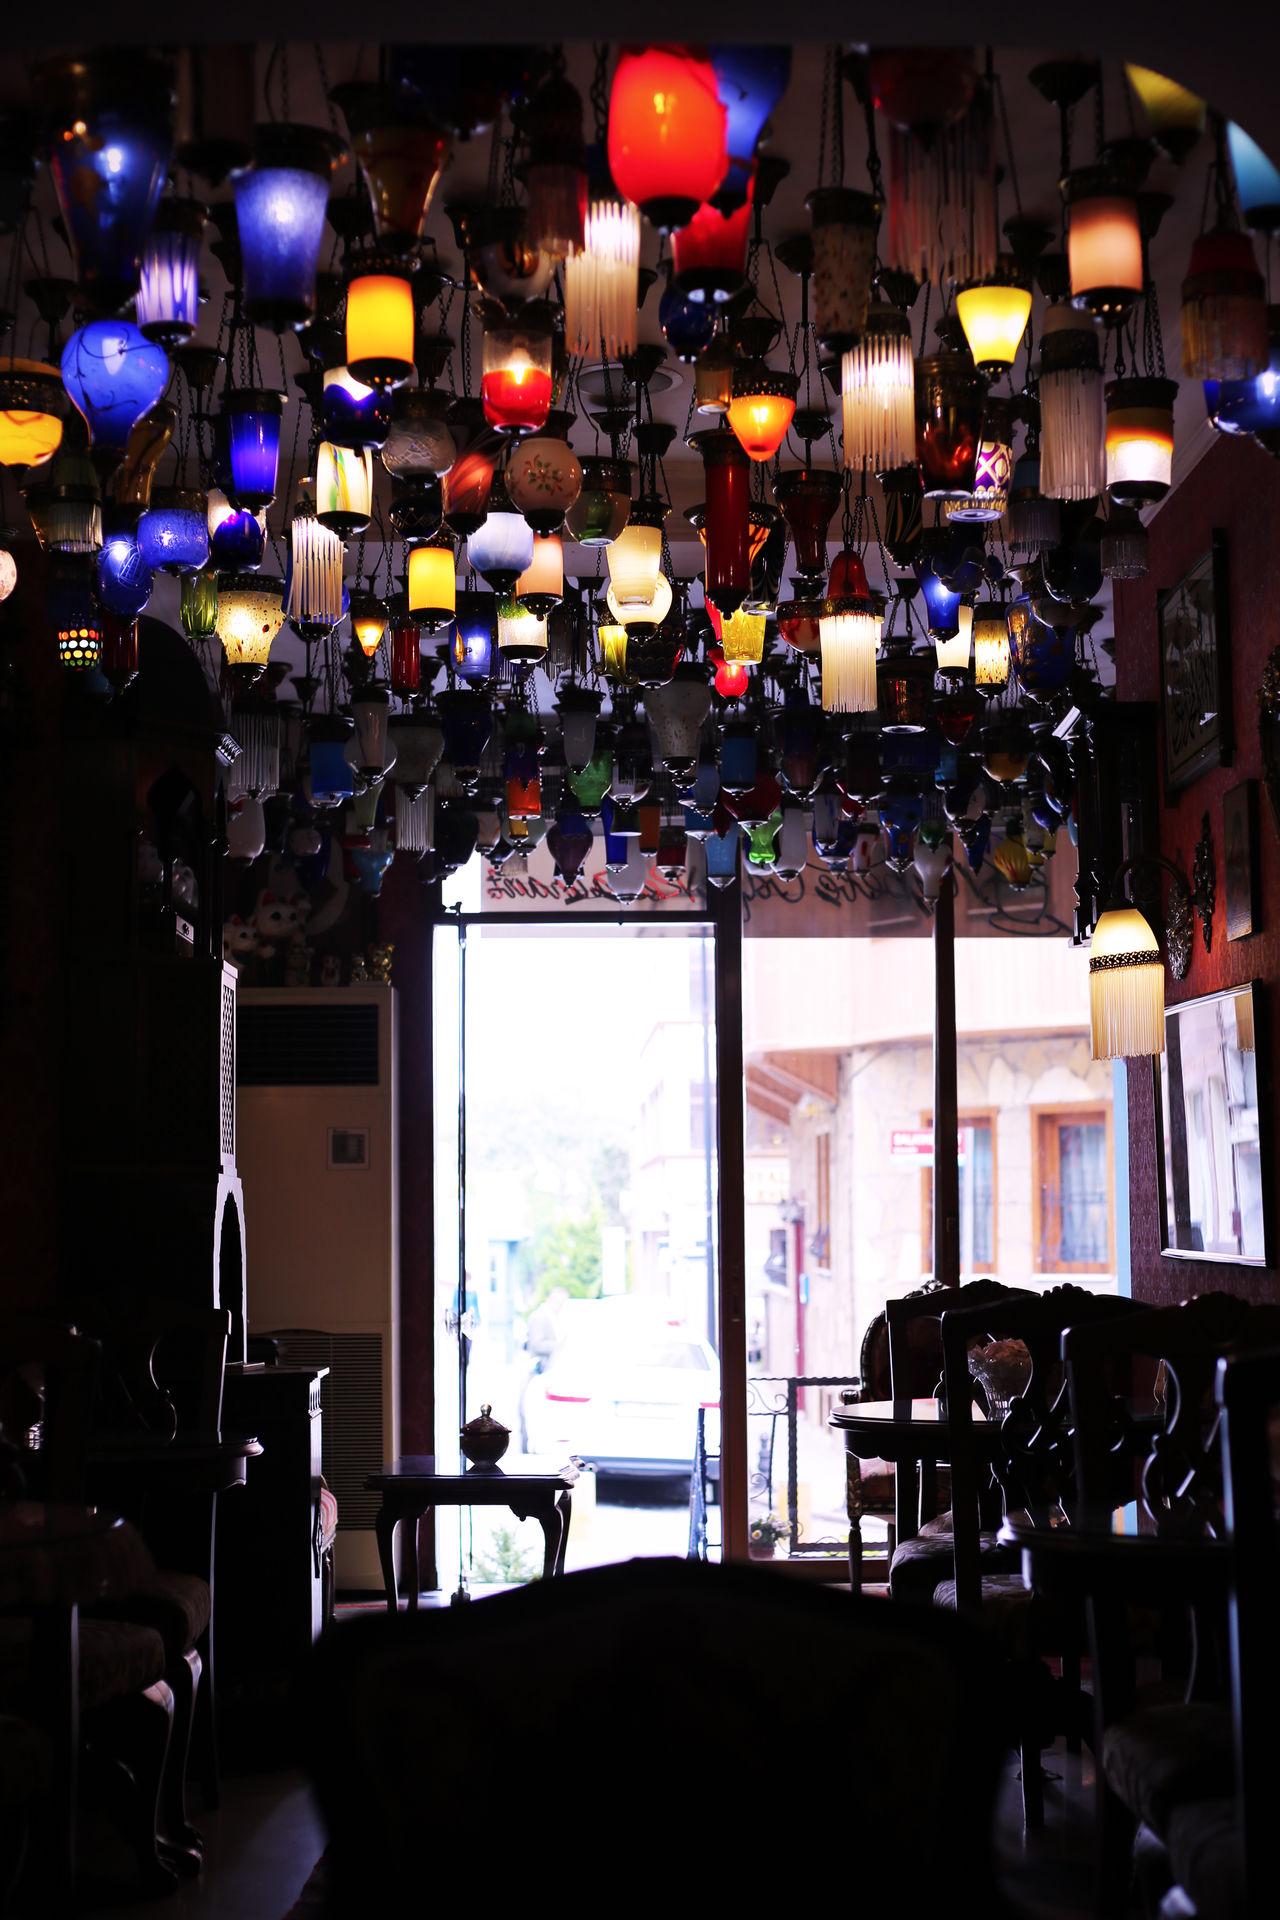 2015  Cafe Colorful Interior Interior Design Istanbul Kybele Hotel Lamp Lamp Hotel Restaurant Table Turkey Türkiye イスタンブール キベルホテル トルコ ランプ ランプのホテル